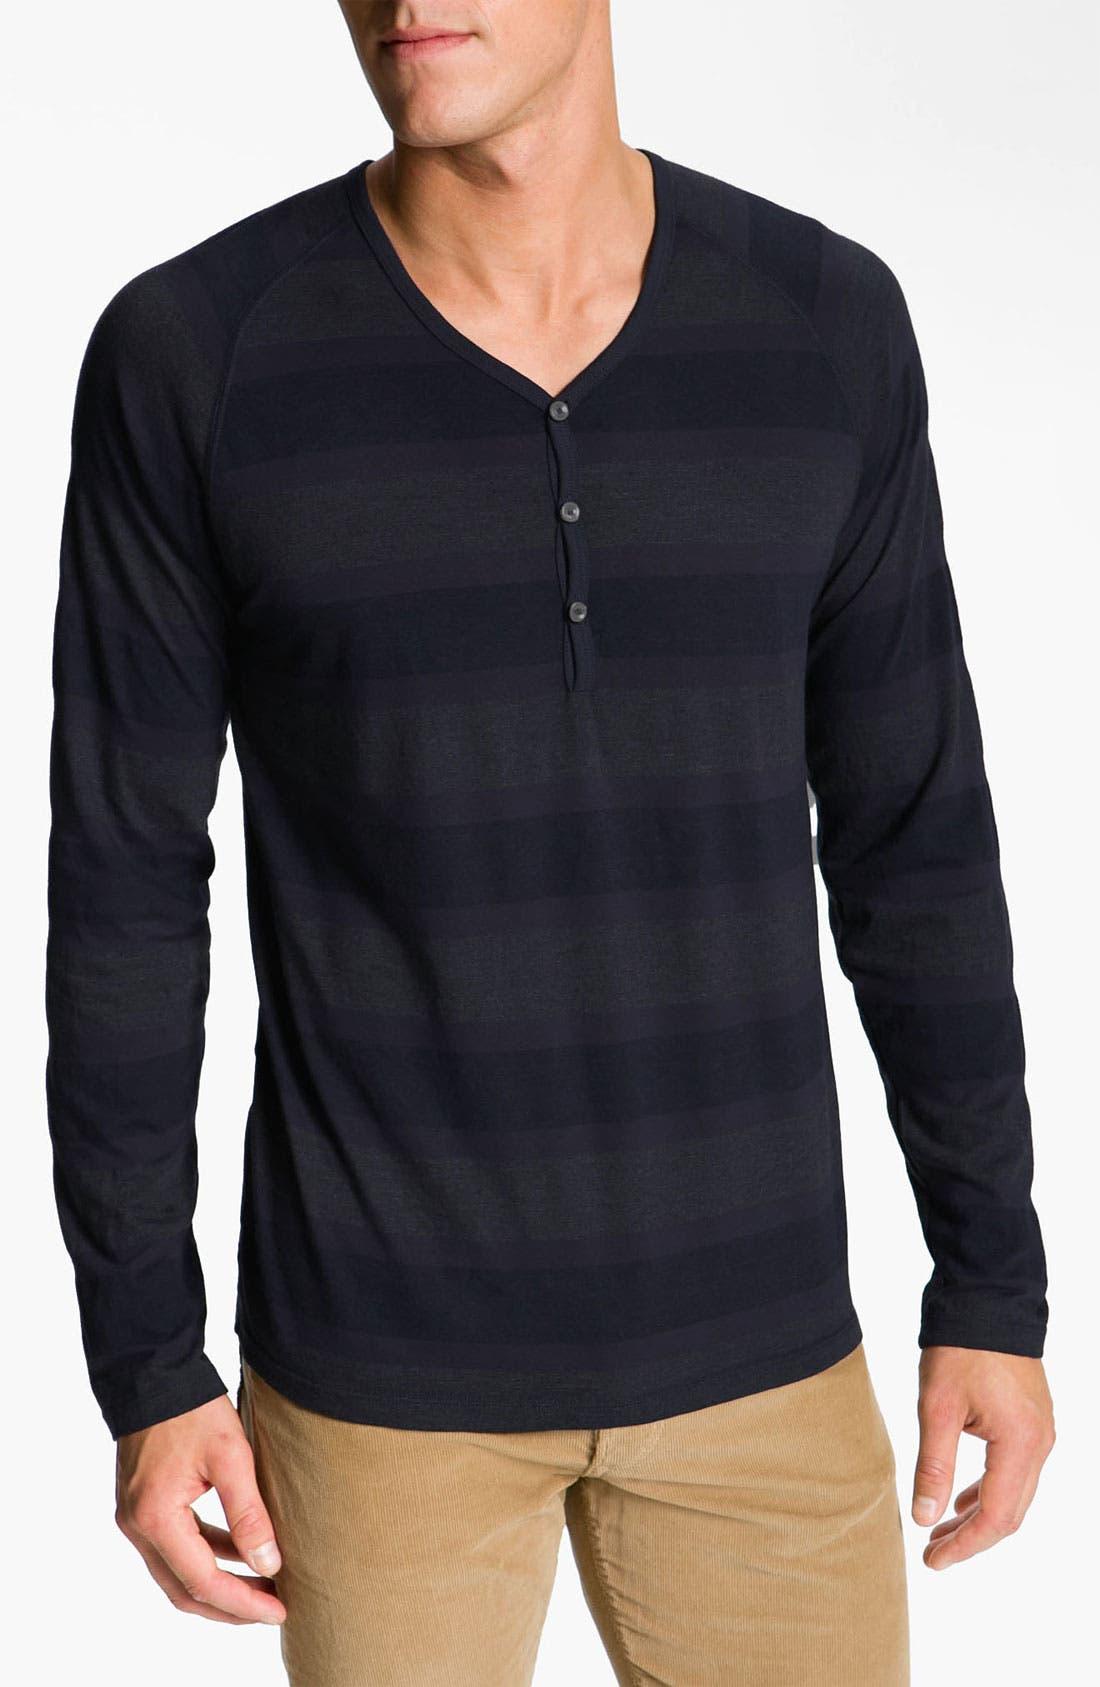 Main Image - NSF Clothing 'Laken' V-Neck Henley